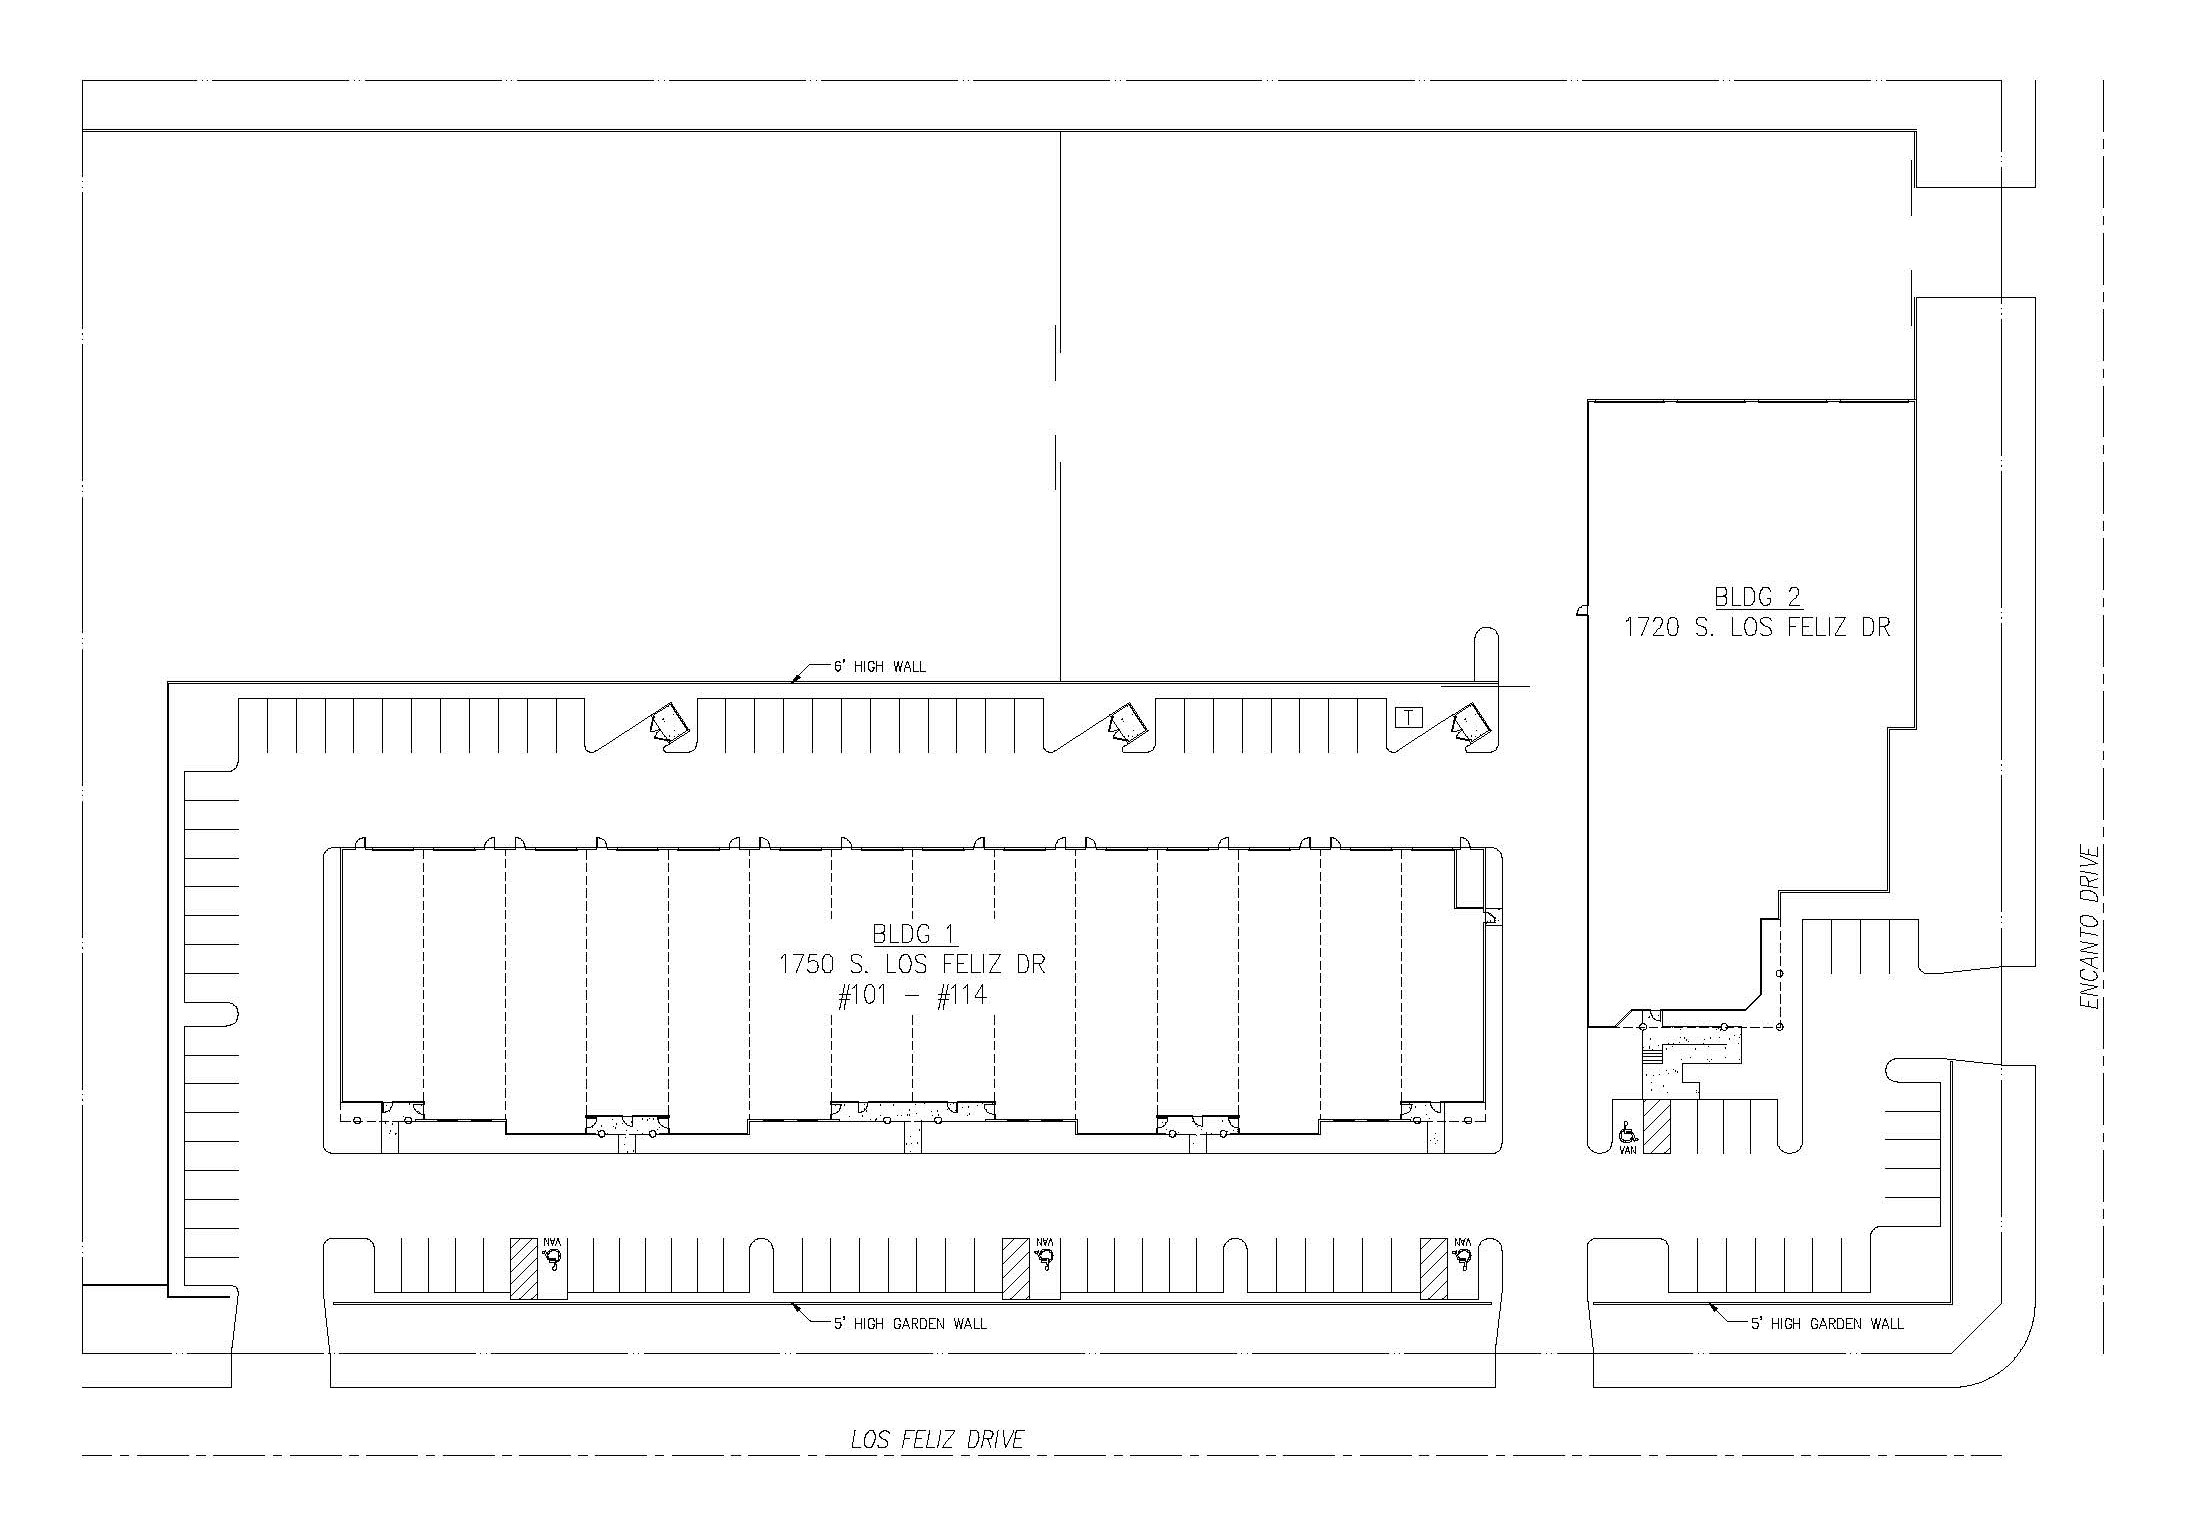 normal junction site_8.5x11.jpg